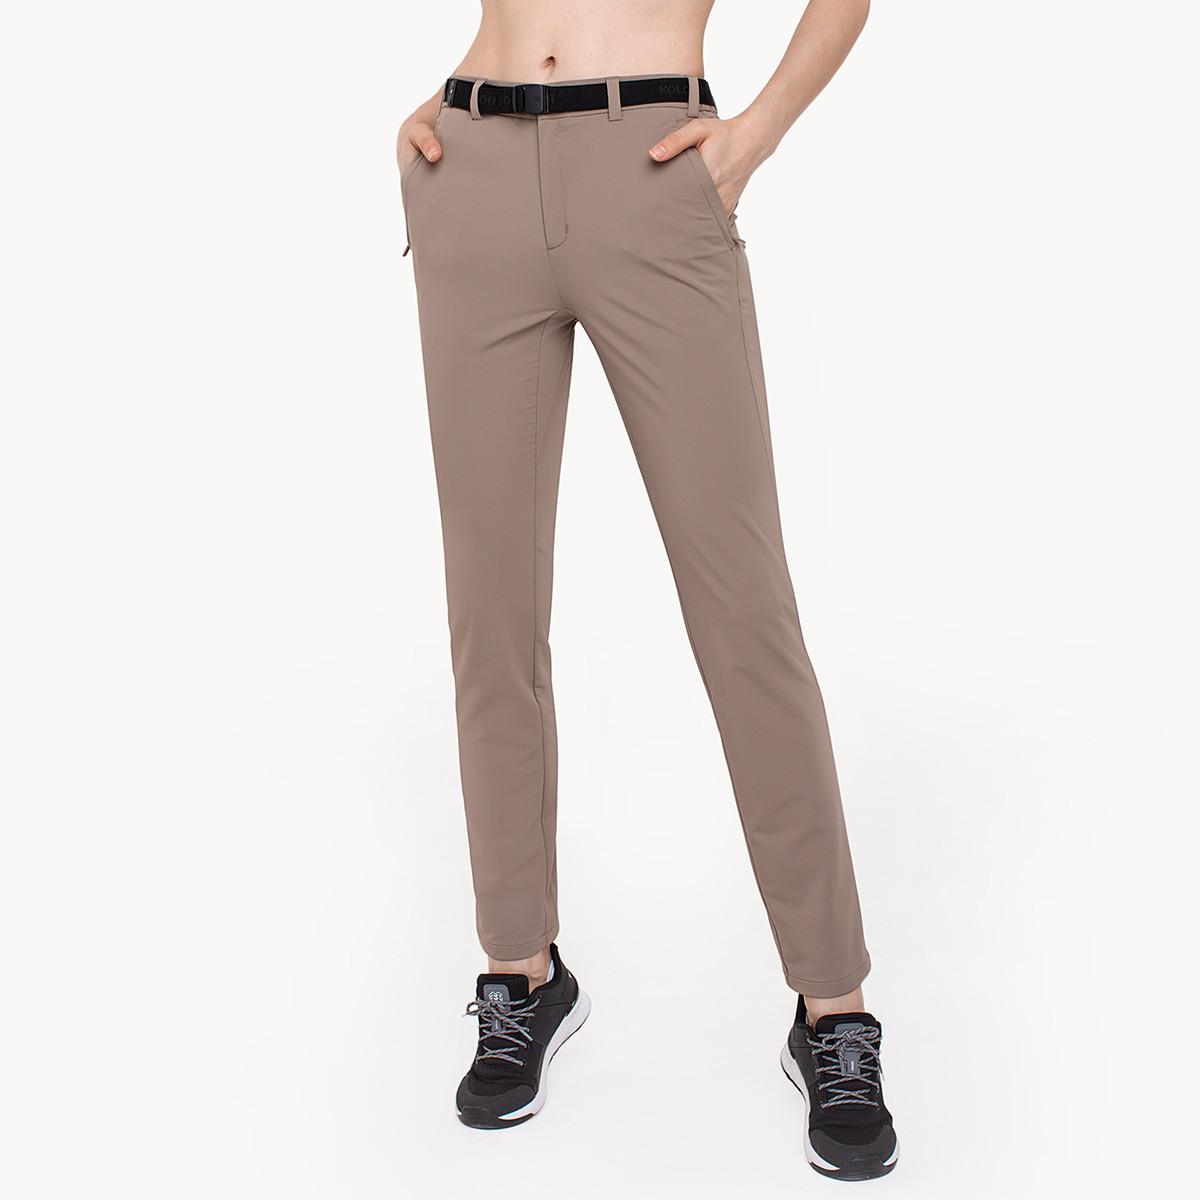 KOLON SPORT可隆裤子秋新款户外柔软透气运动休闲裤女子火山岩长裤LKLP9AN410-BE